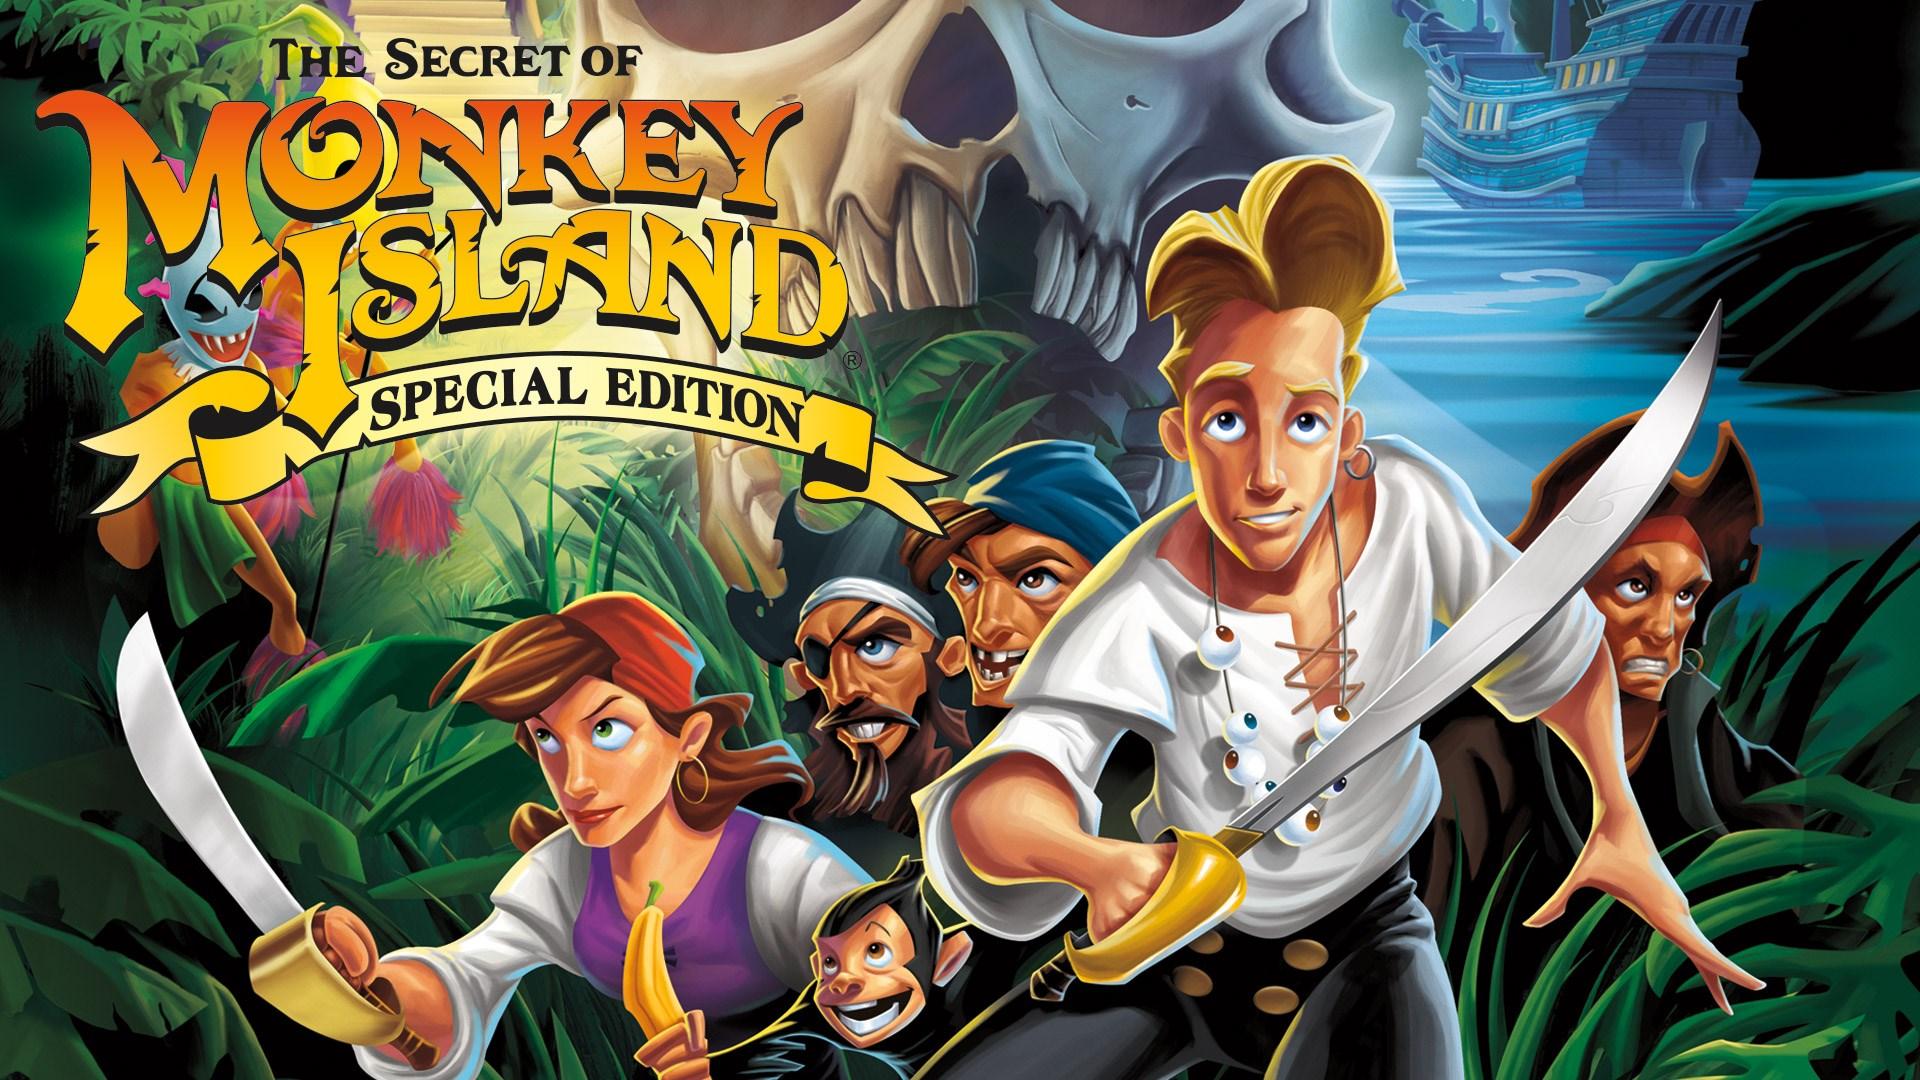 Monkey Island: Special Edition